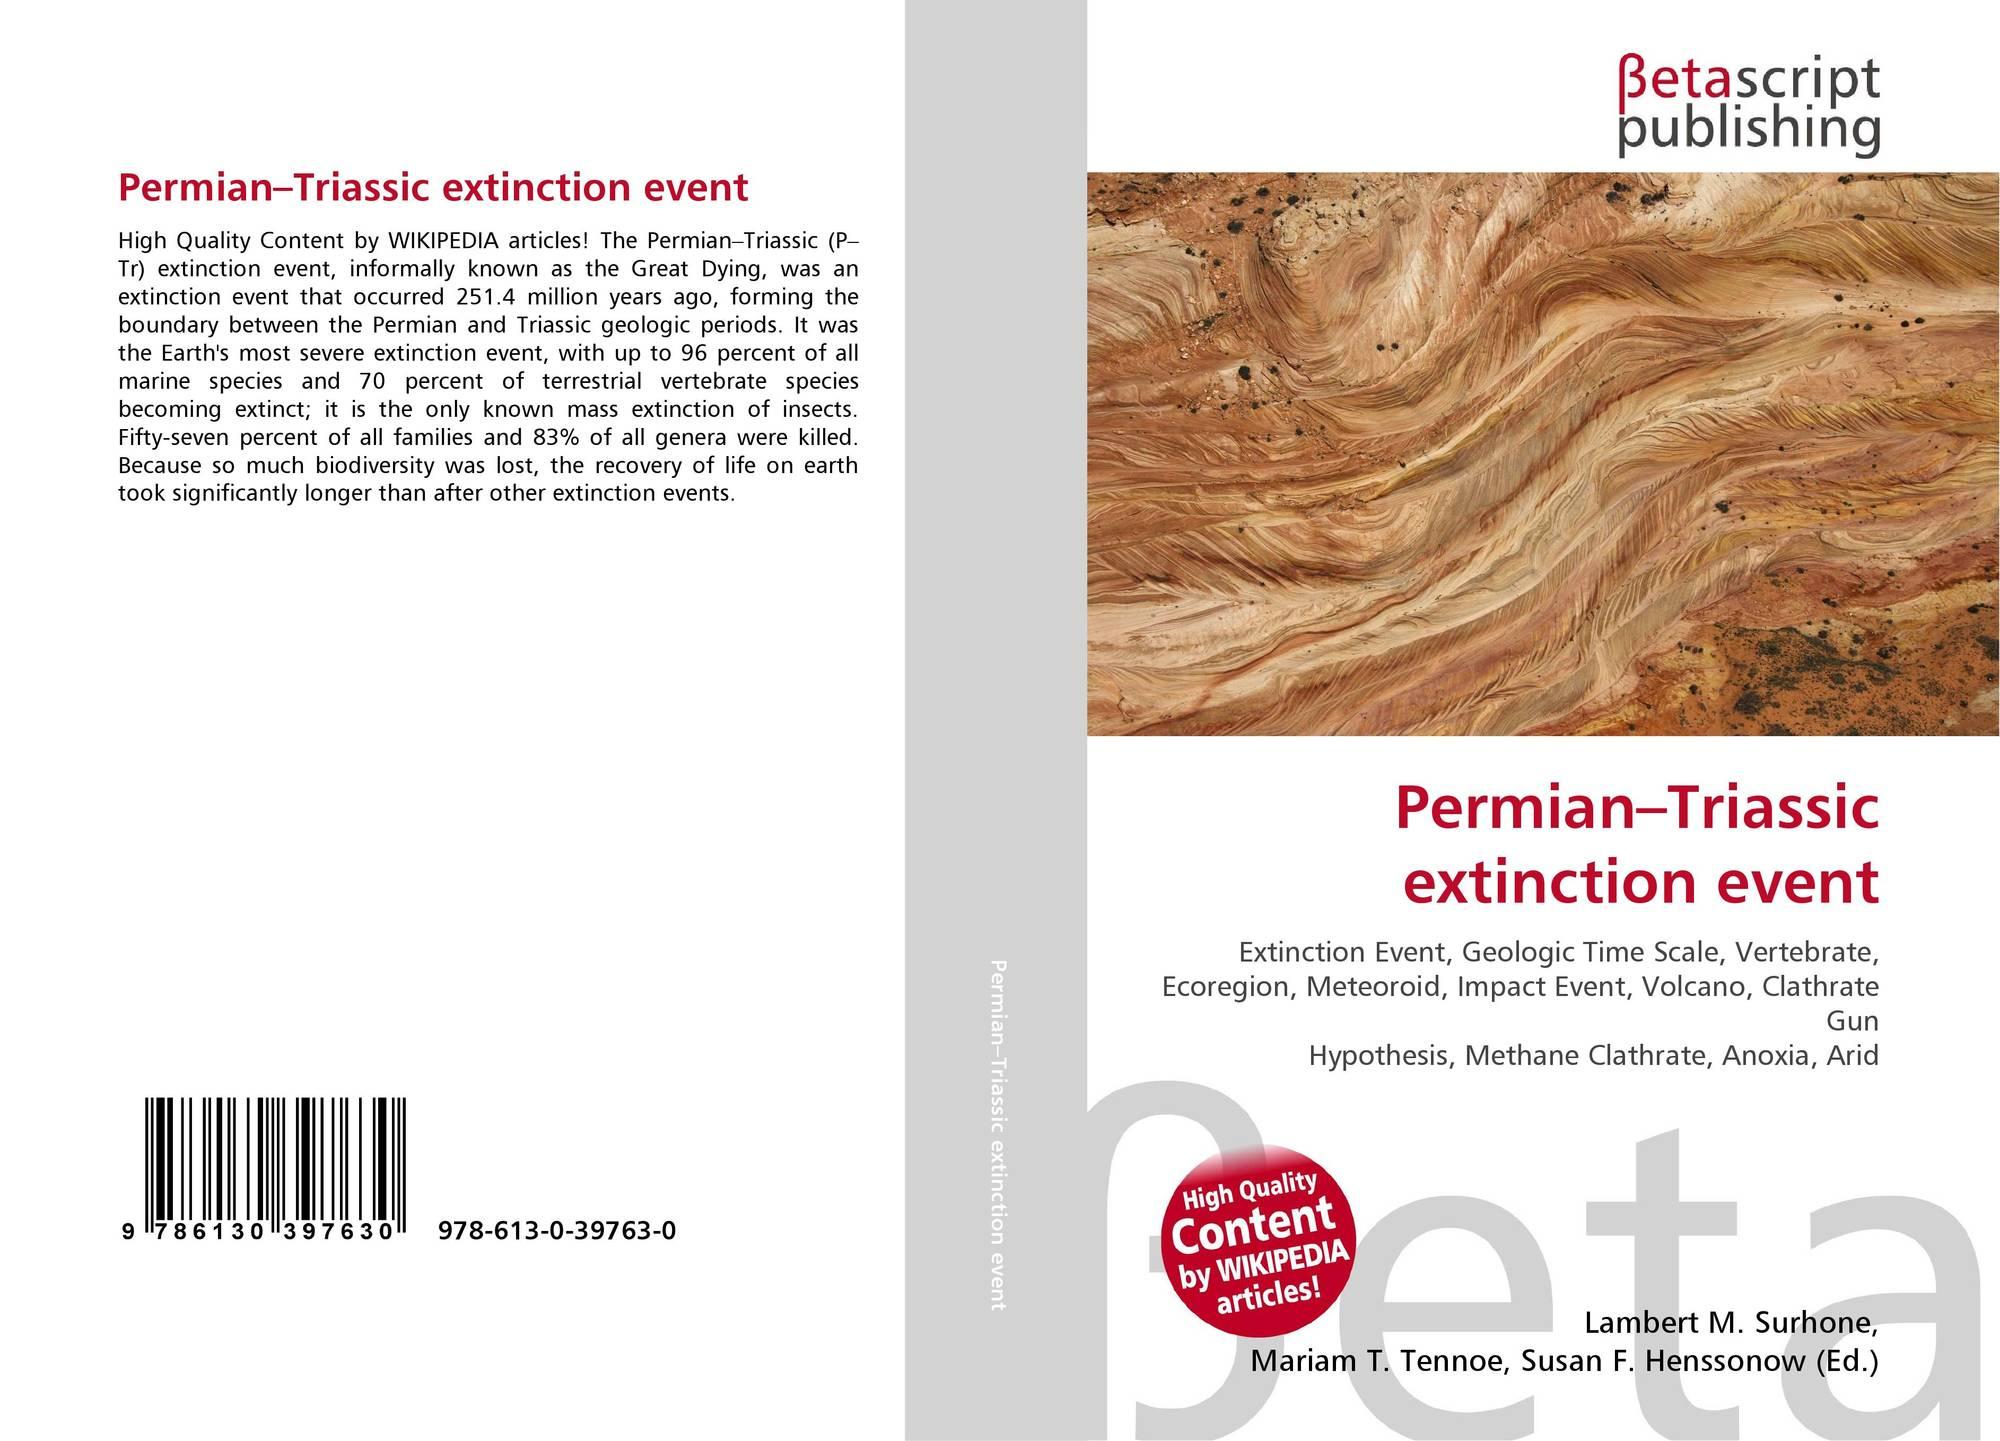 Permian–Triassic extinction event, 978-613-0-39763-0